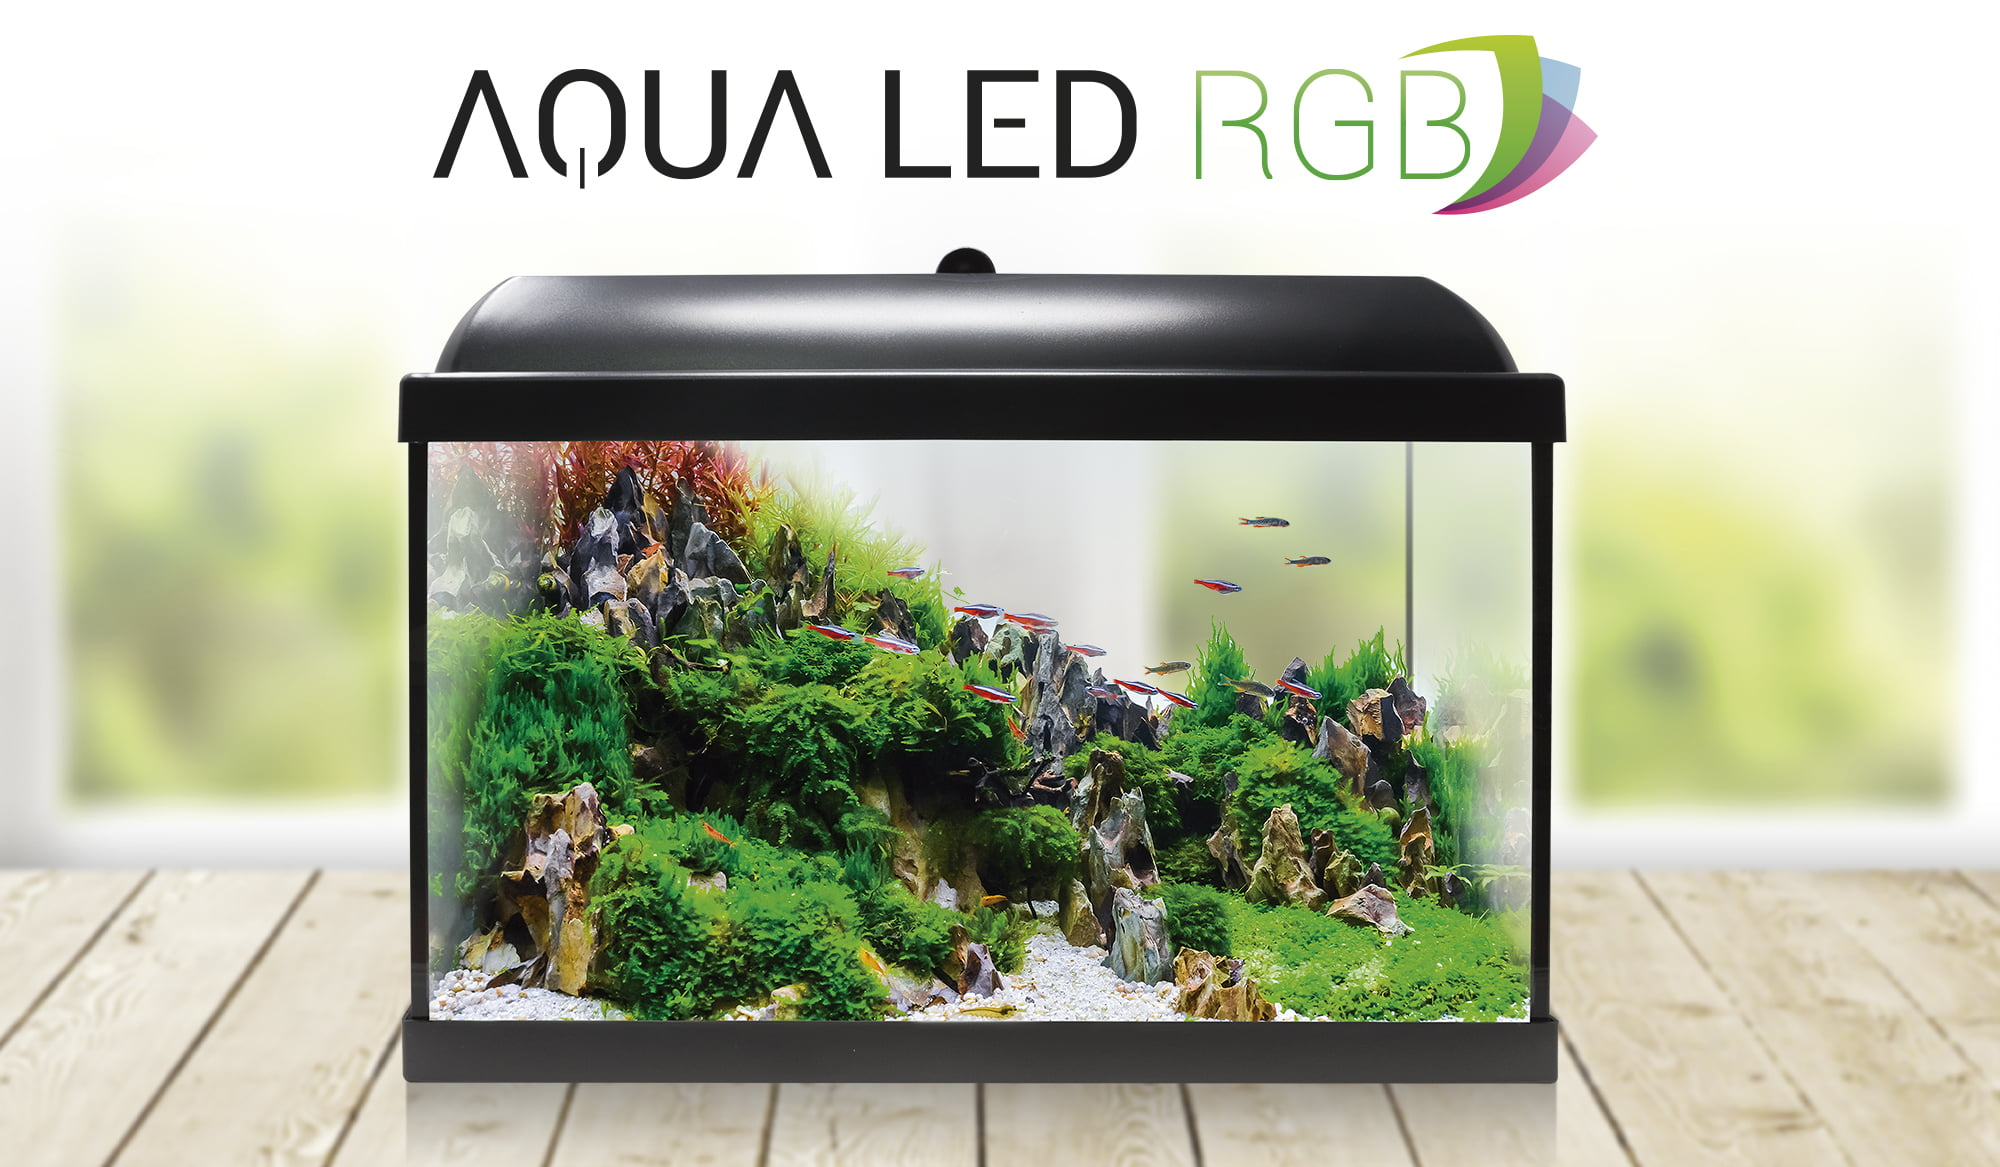 Nuevos acuarios AQUA LED RGB